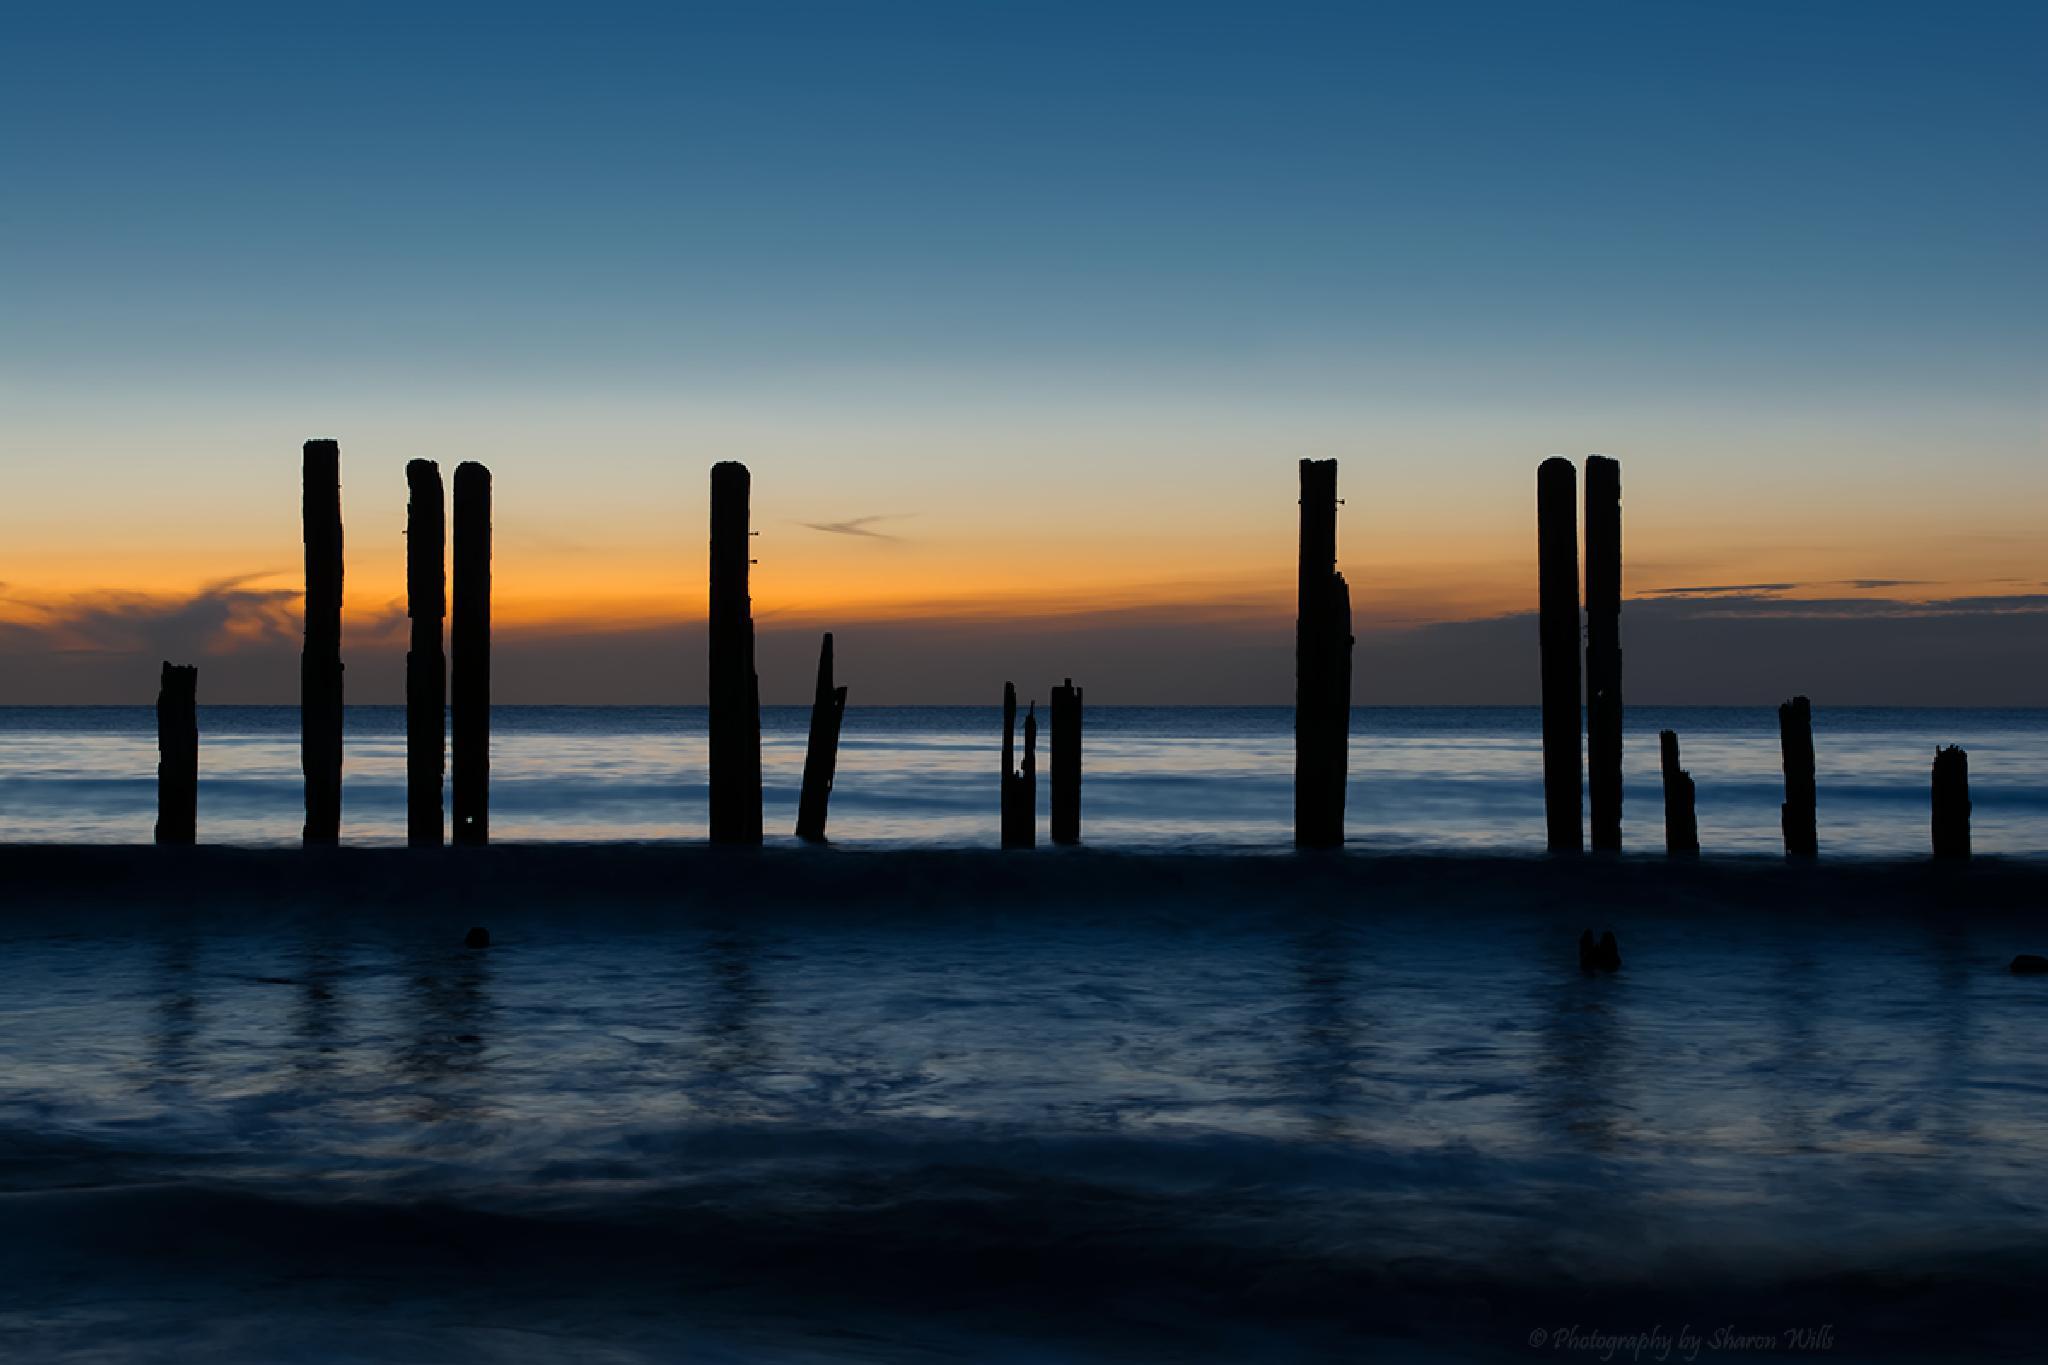 Liquid Sunsets by Sharon Wills